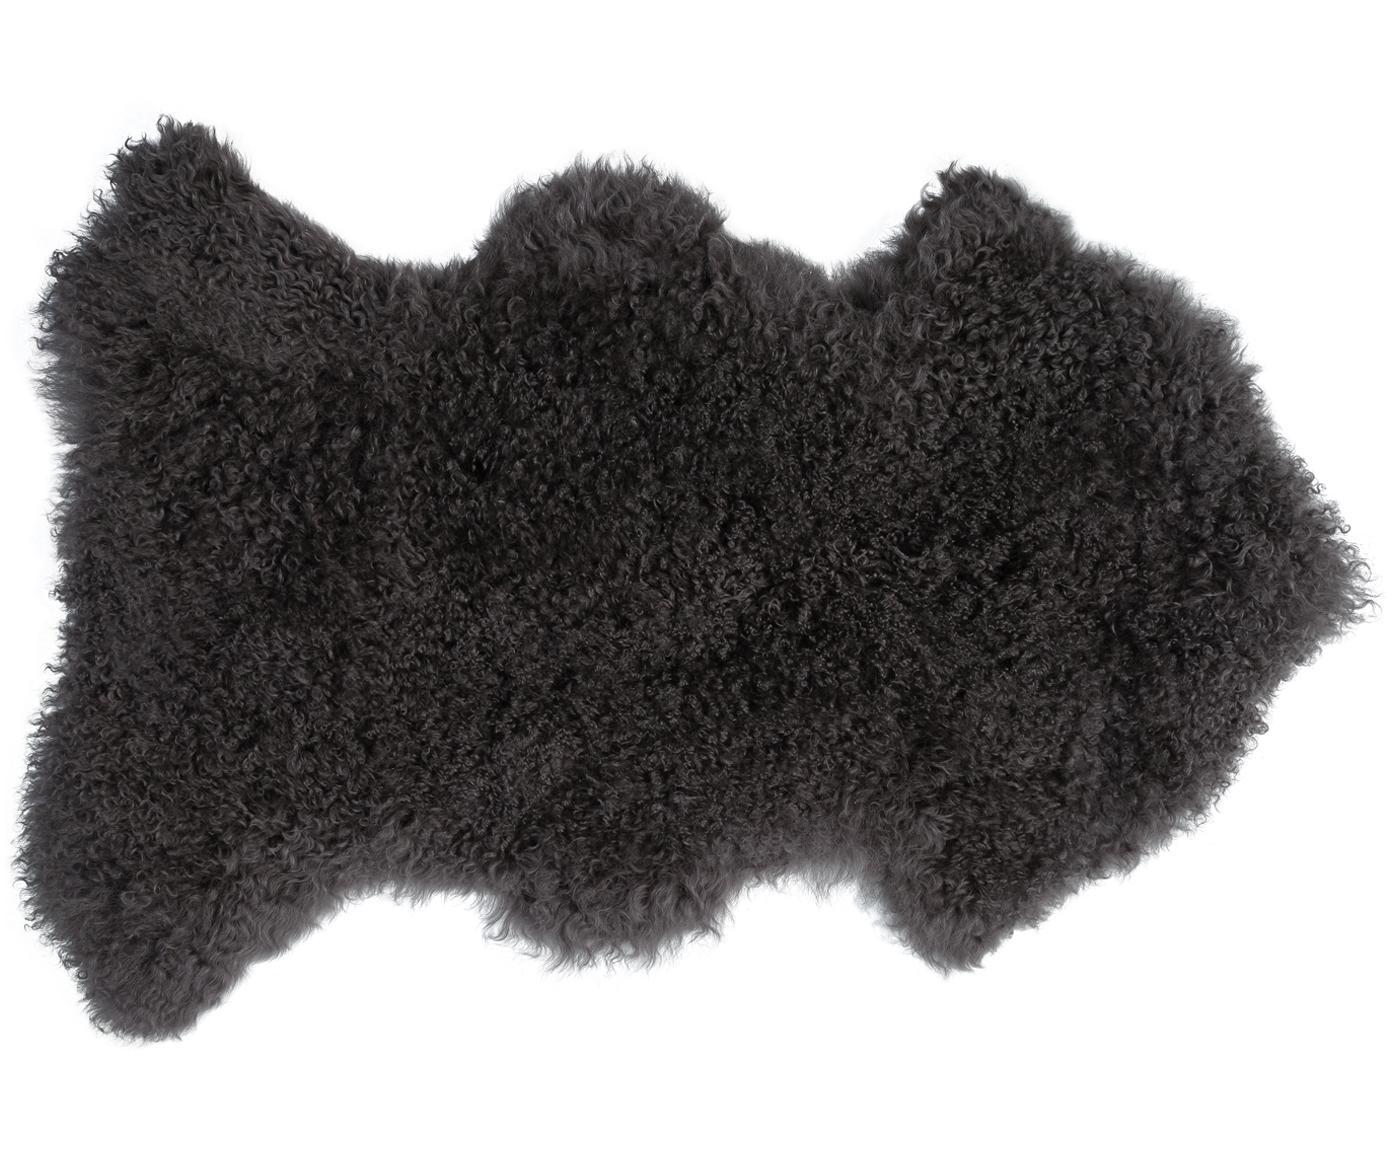 Langhaar-Lammfell Ella, gelockt, Vorderseite: Mongolisches Lammfell, Rückseite: Leder, Dunkelgrau, 50 x 80 cm